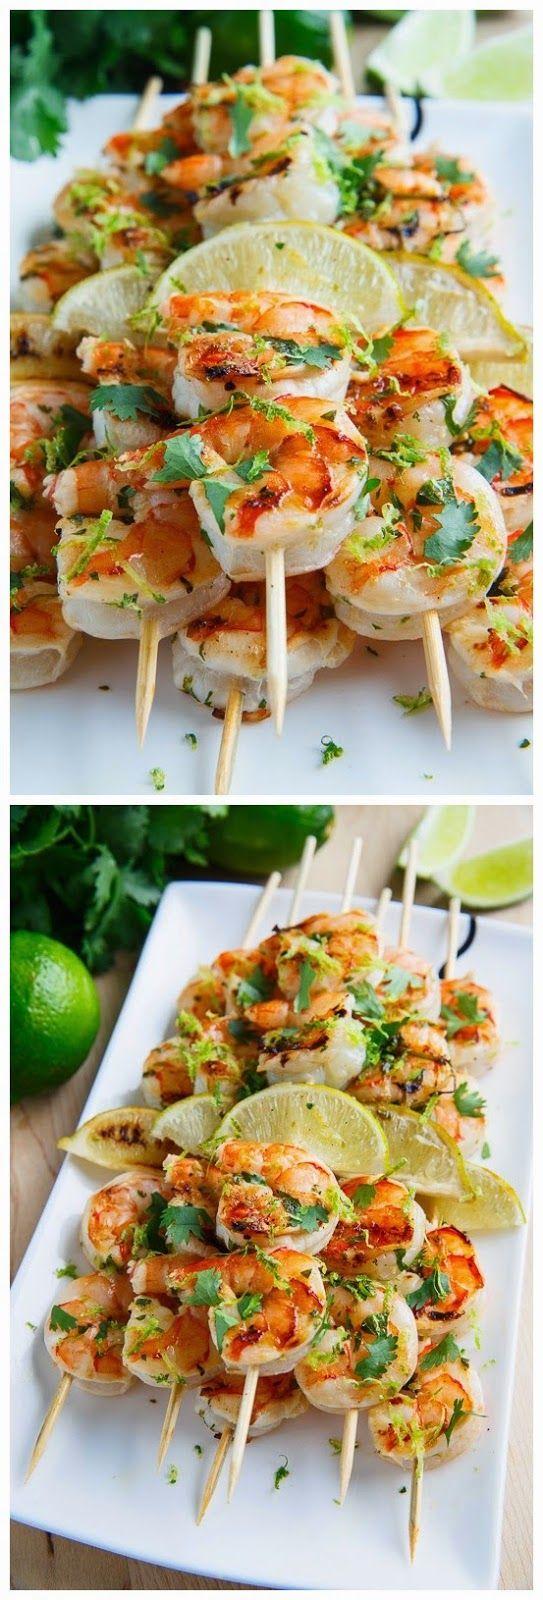 Cilantro Lime Grilled Shrimp Food Recipes Food Cooking Recipes